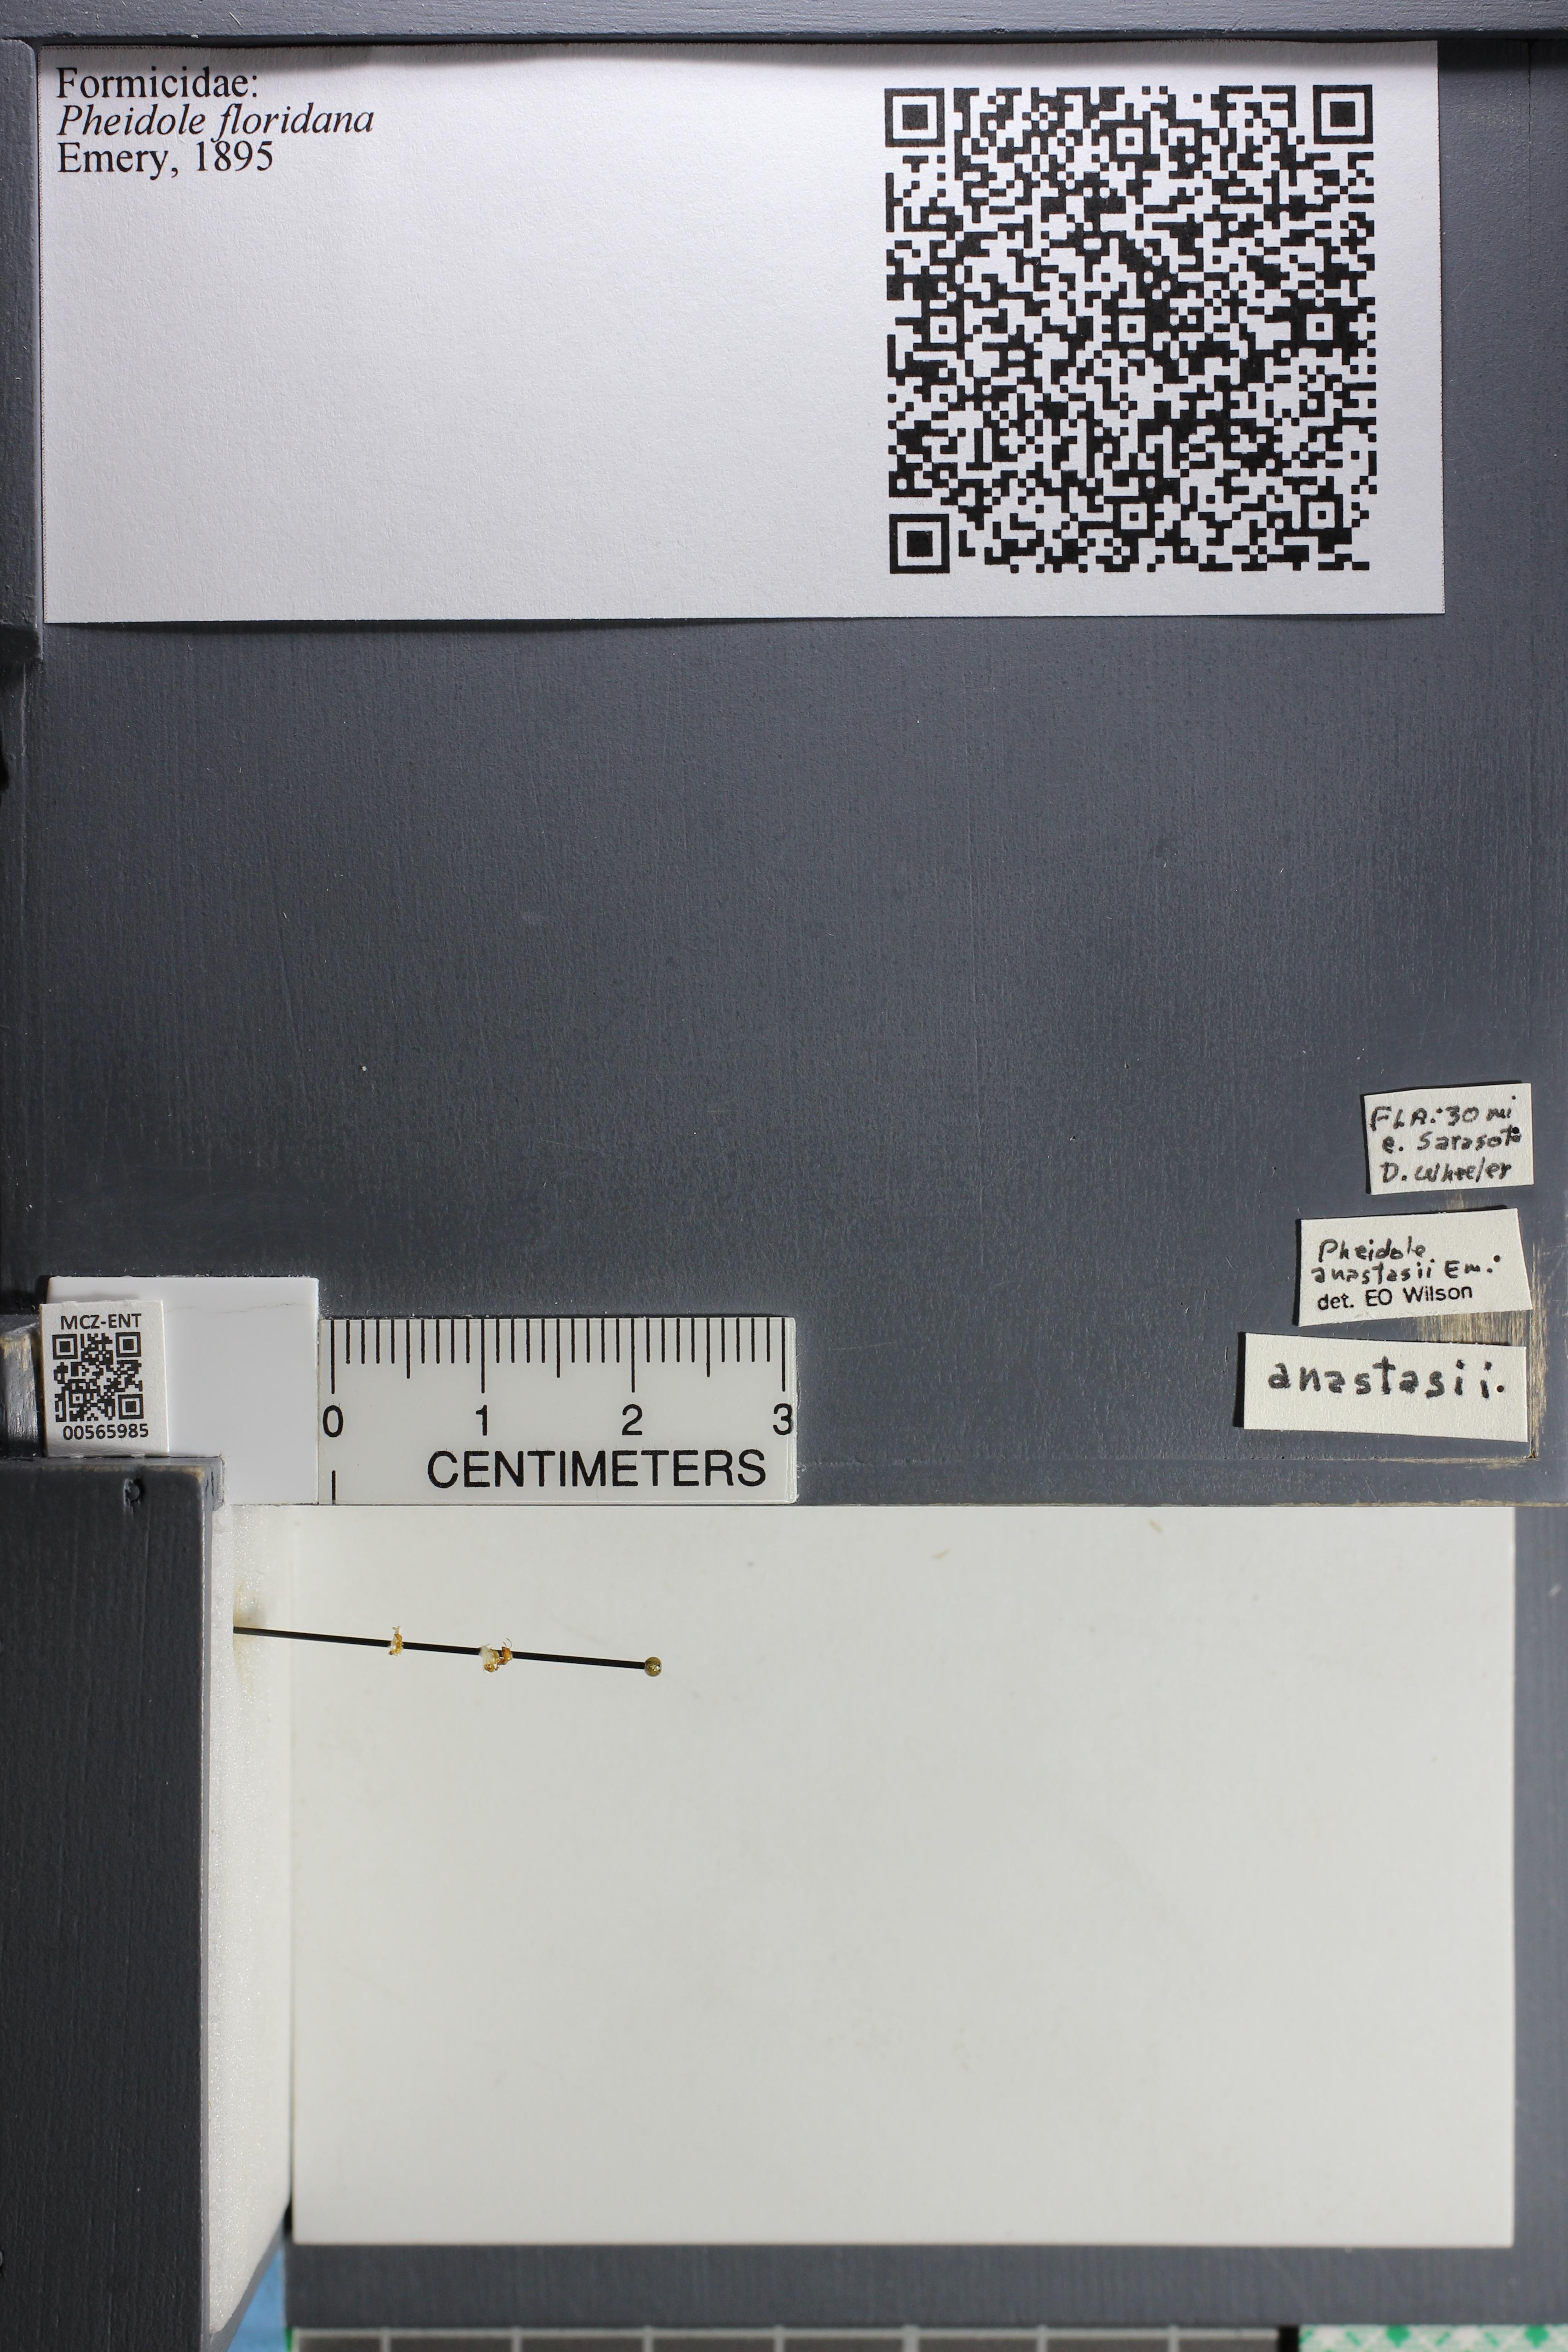 Media of type image, MCZ:Ent:565985 Identified as Pheidole floridana.